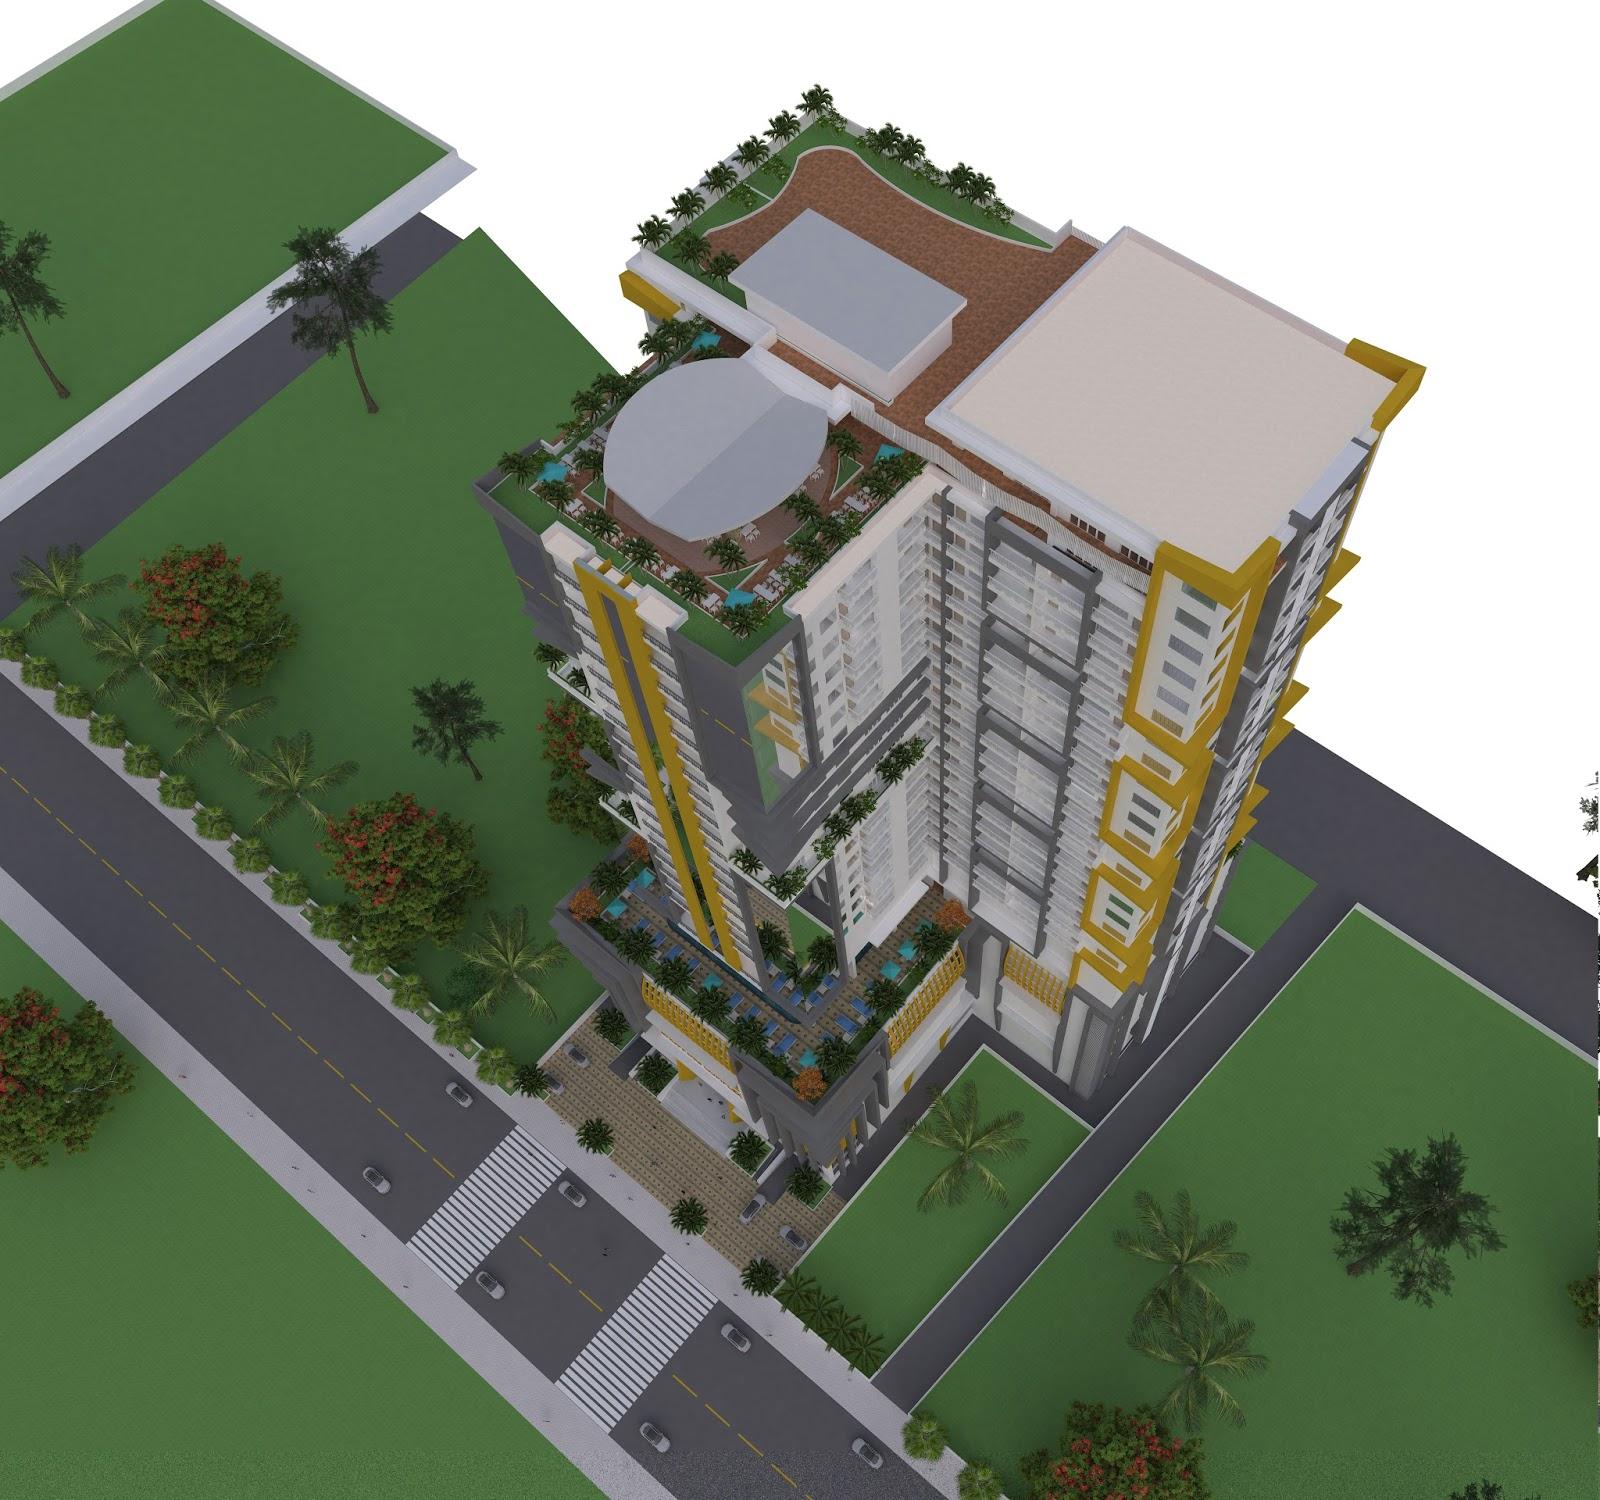 Sketchup Home Design: Sketchup Aparment Building